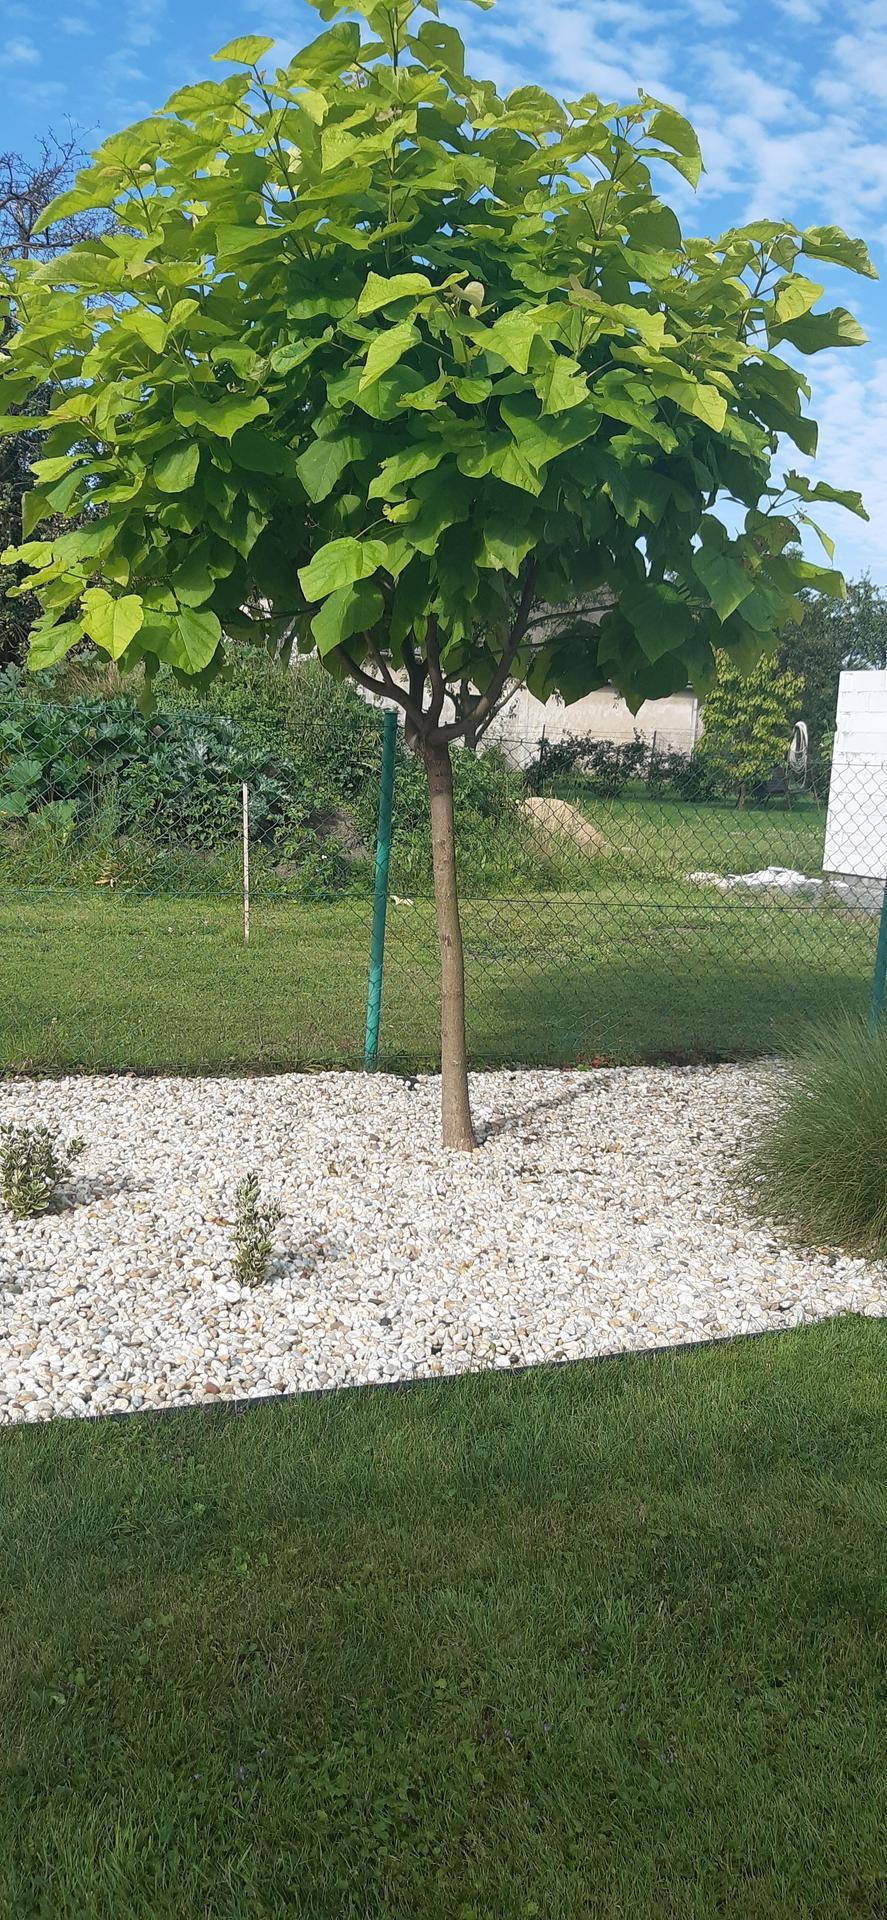 Zahrada 2020 - Obrázek č. 29